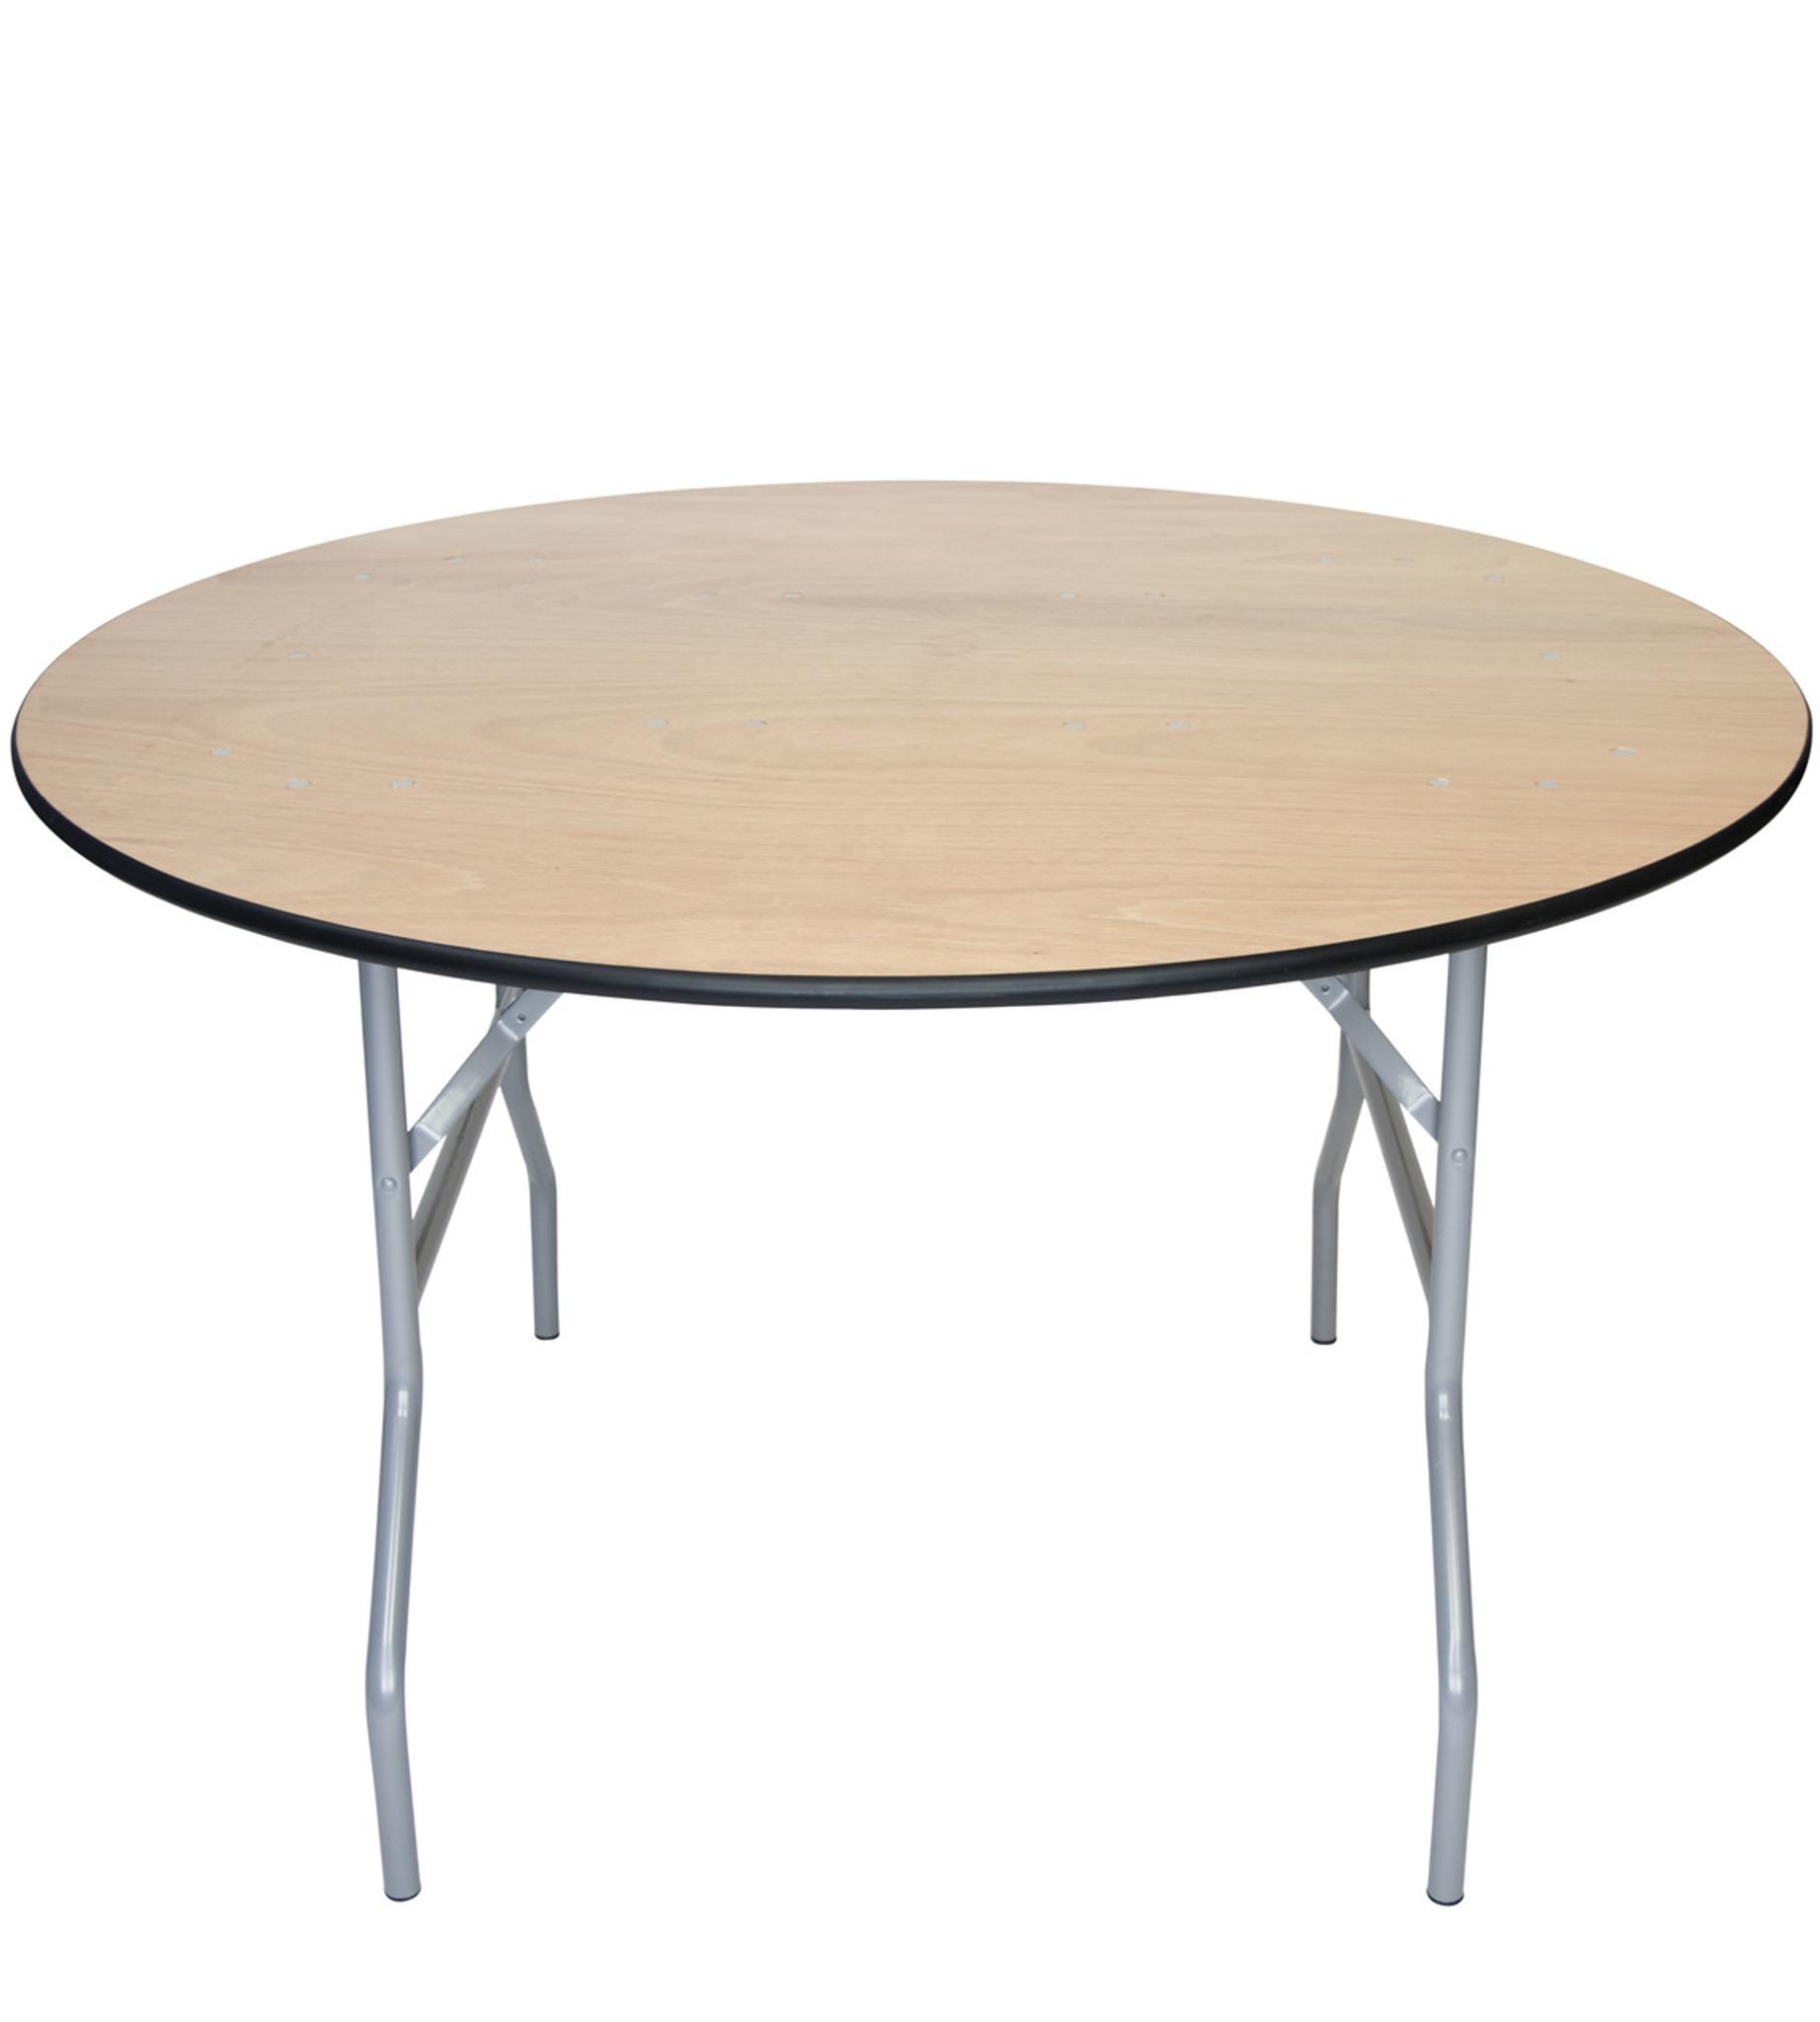 Classic series 48 4 ft round plywood folding table vinyl classic series 48 4 ft round plywood folding table vinyl edging jeuxipadfo Choice Image